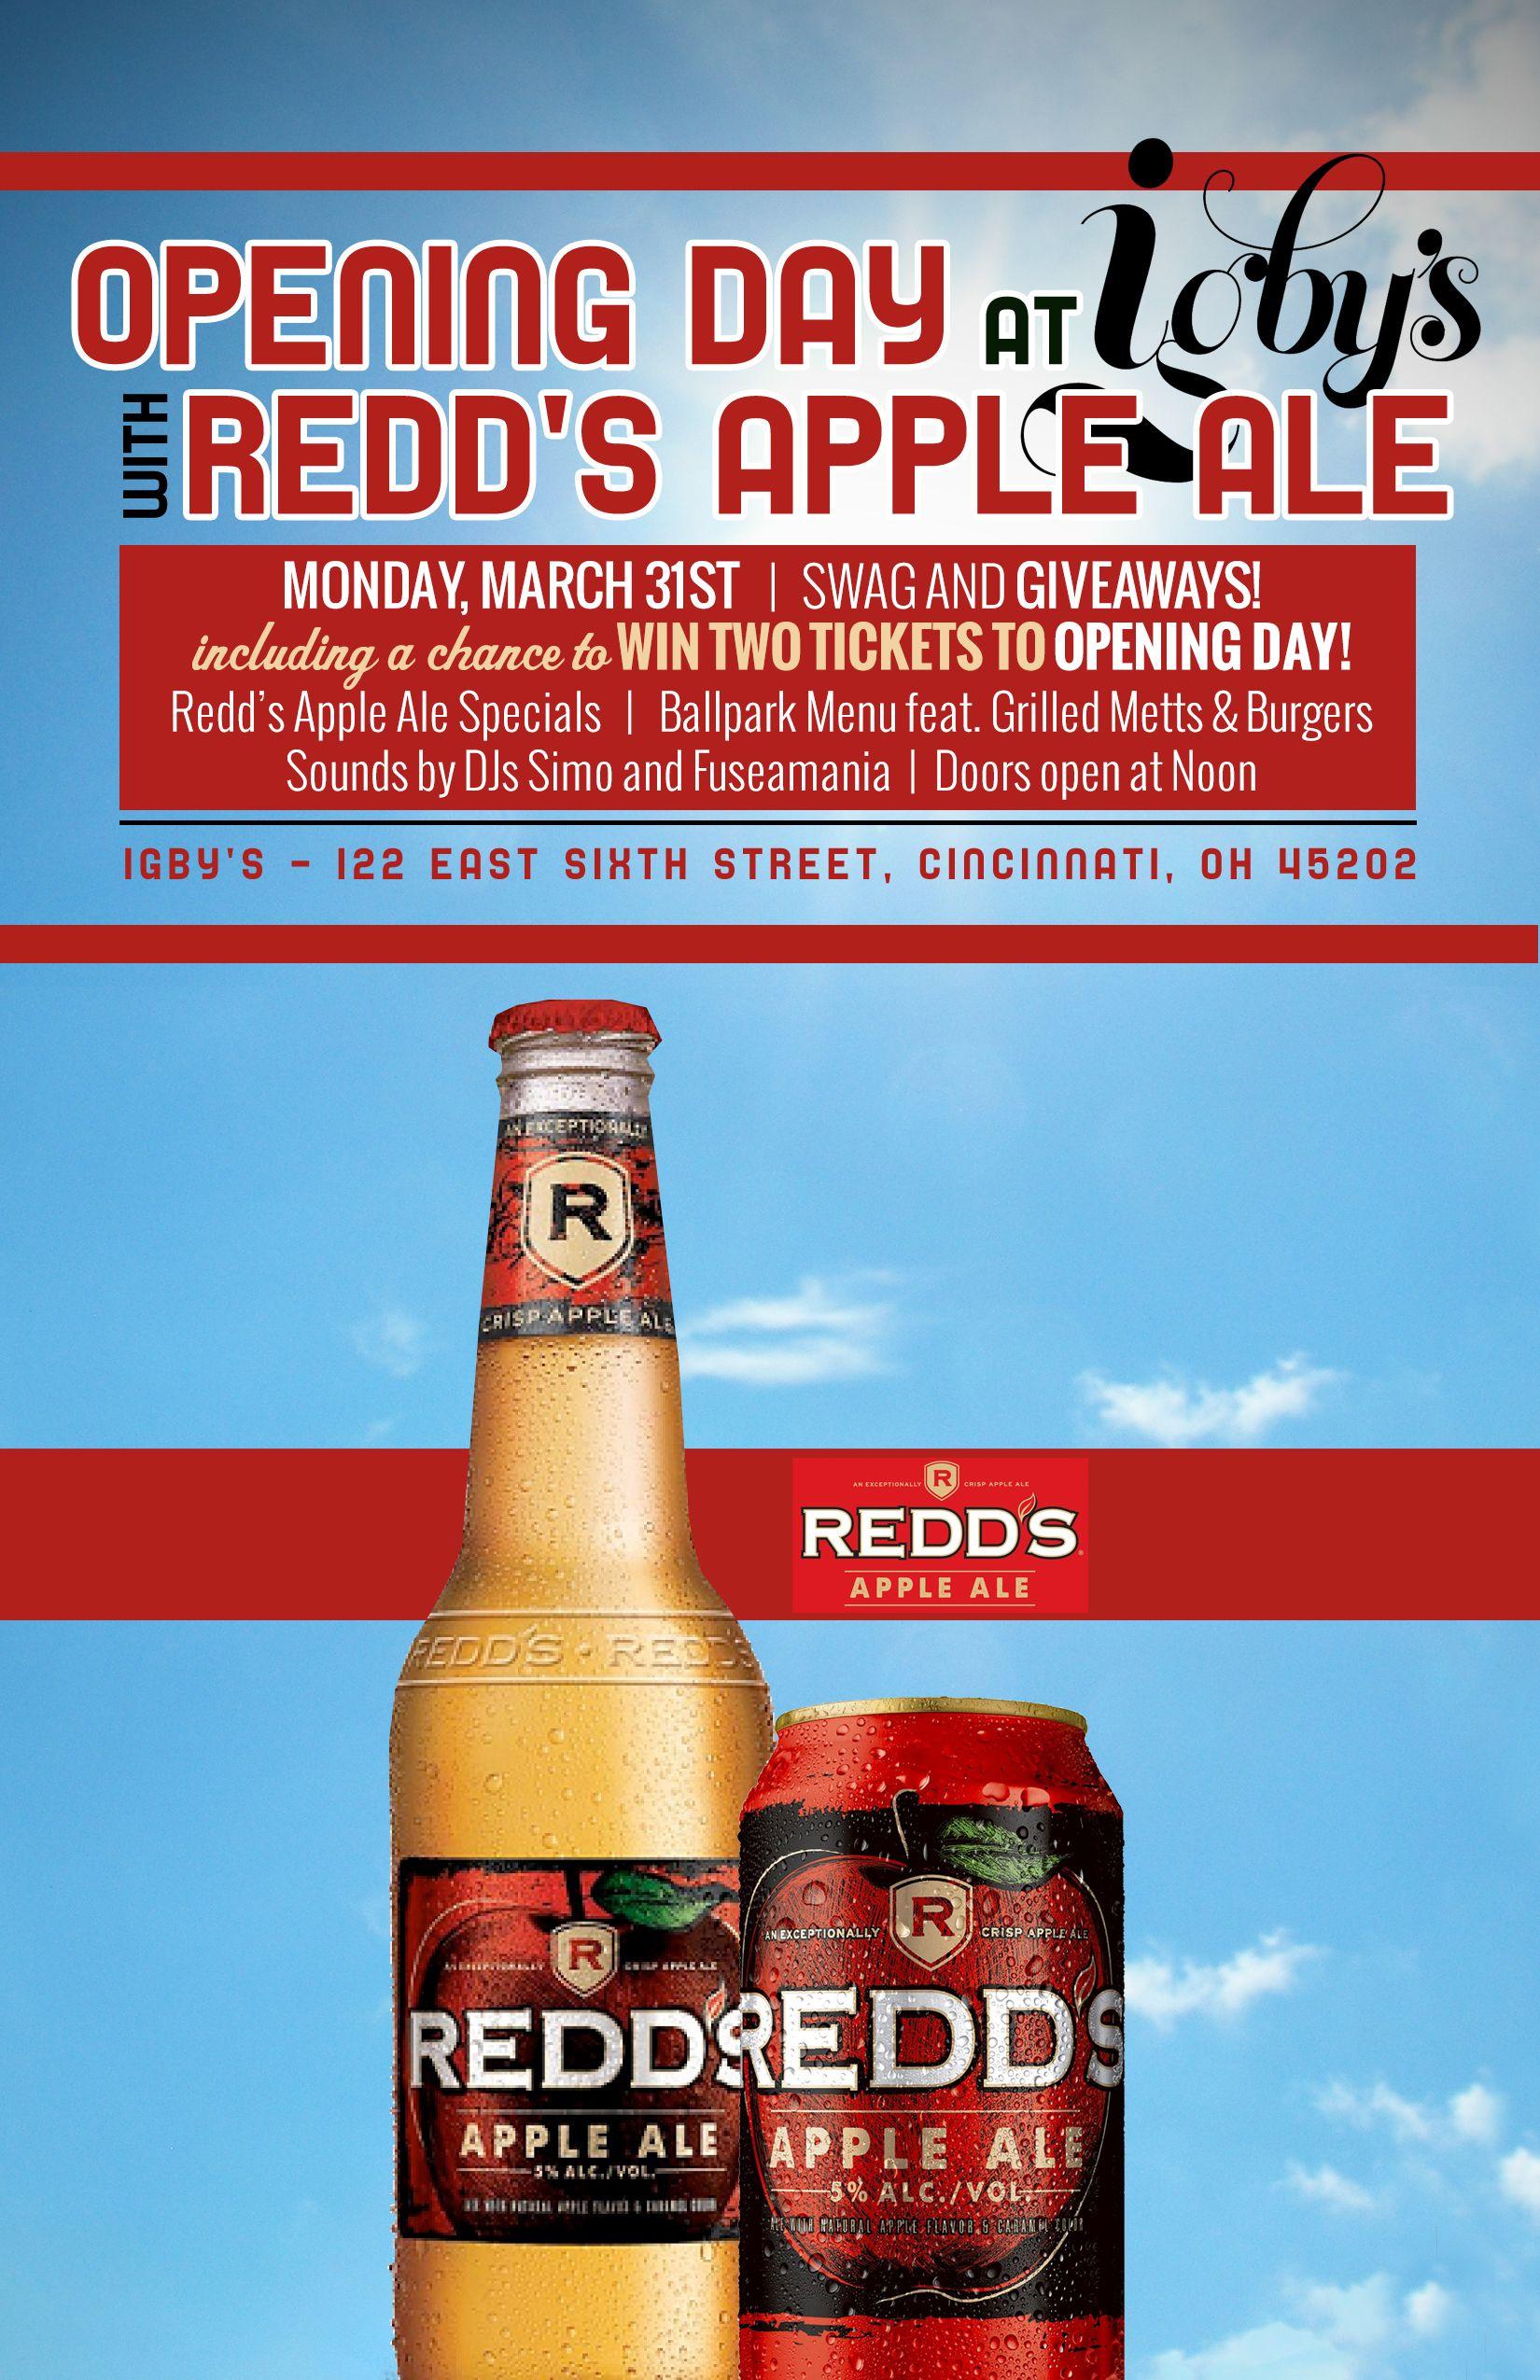 Opening Day Is Finally Here Cincinnati Reds Redsnation Redlegs Corona Beer Bottle Simo Beer Bottle